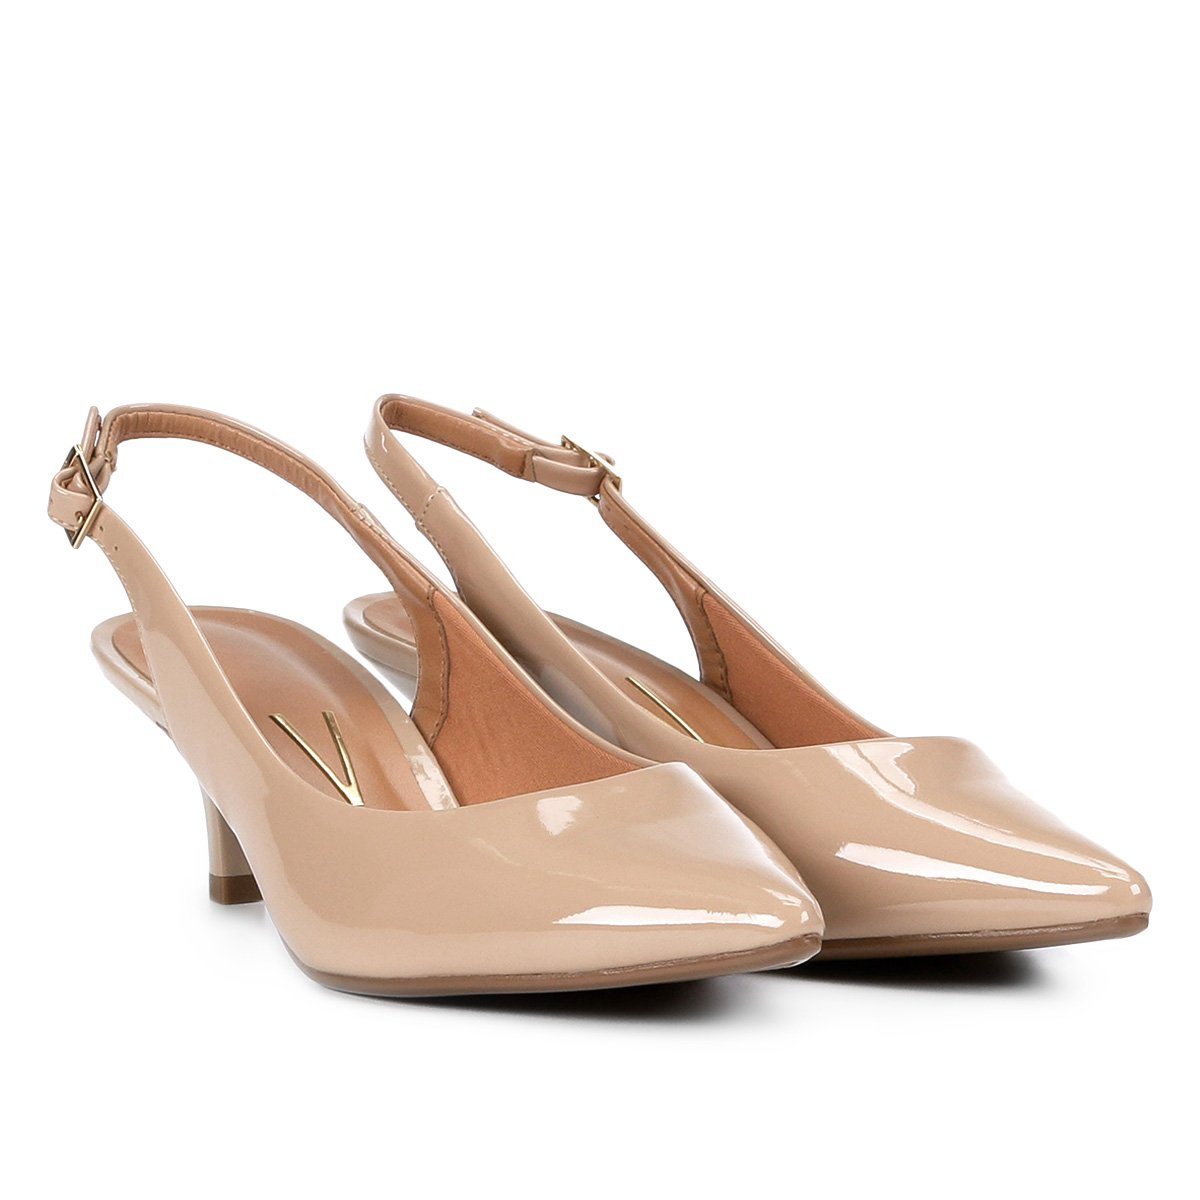 Sapato scarpin salto baixo nude verniz modare - R$ 99.99